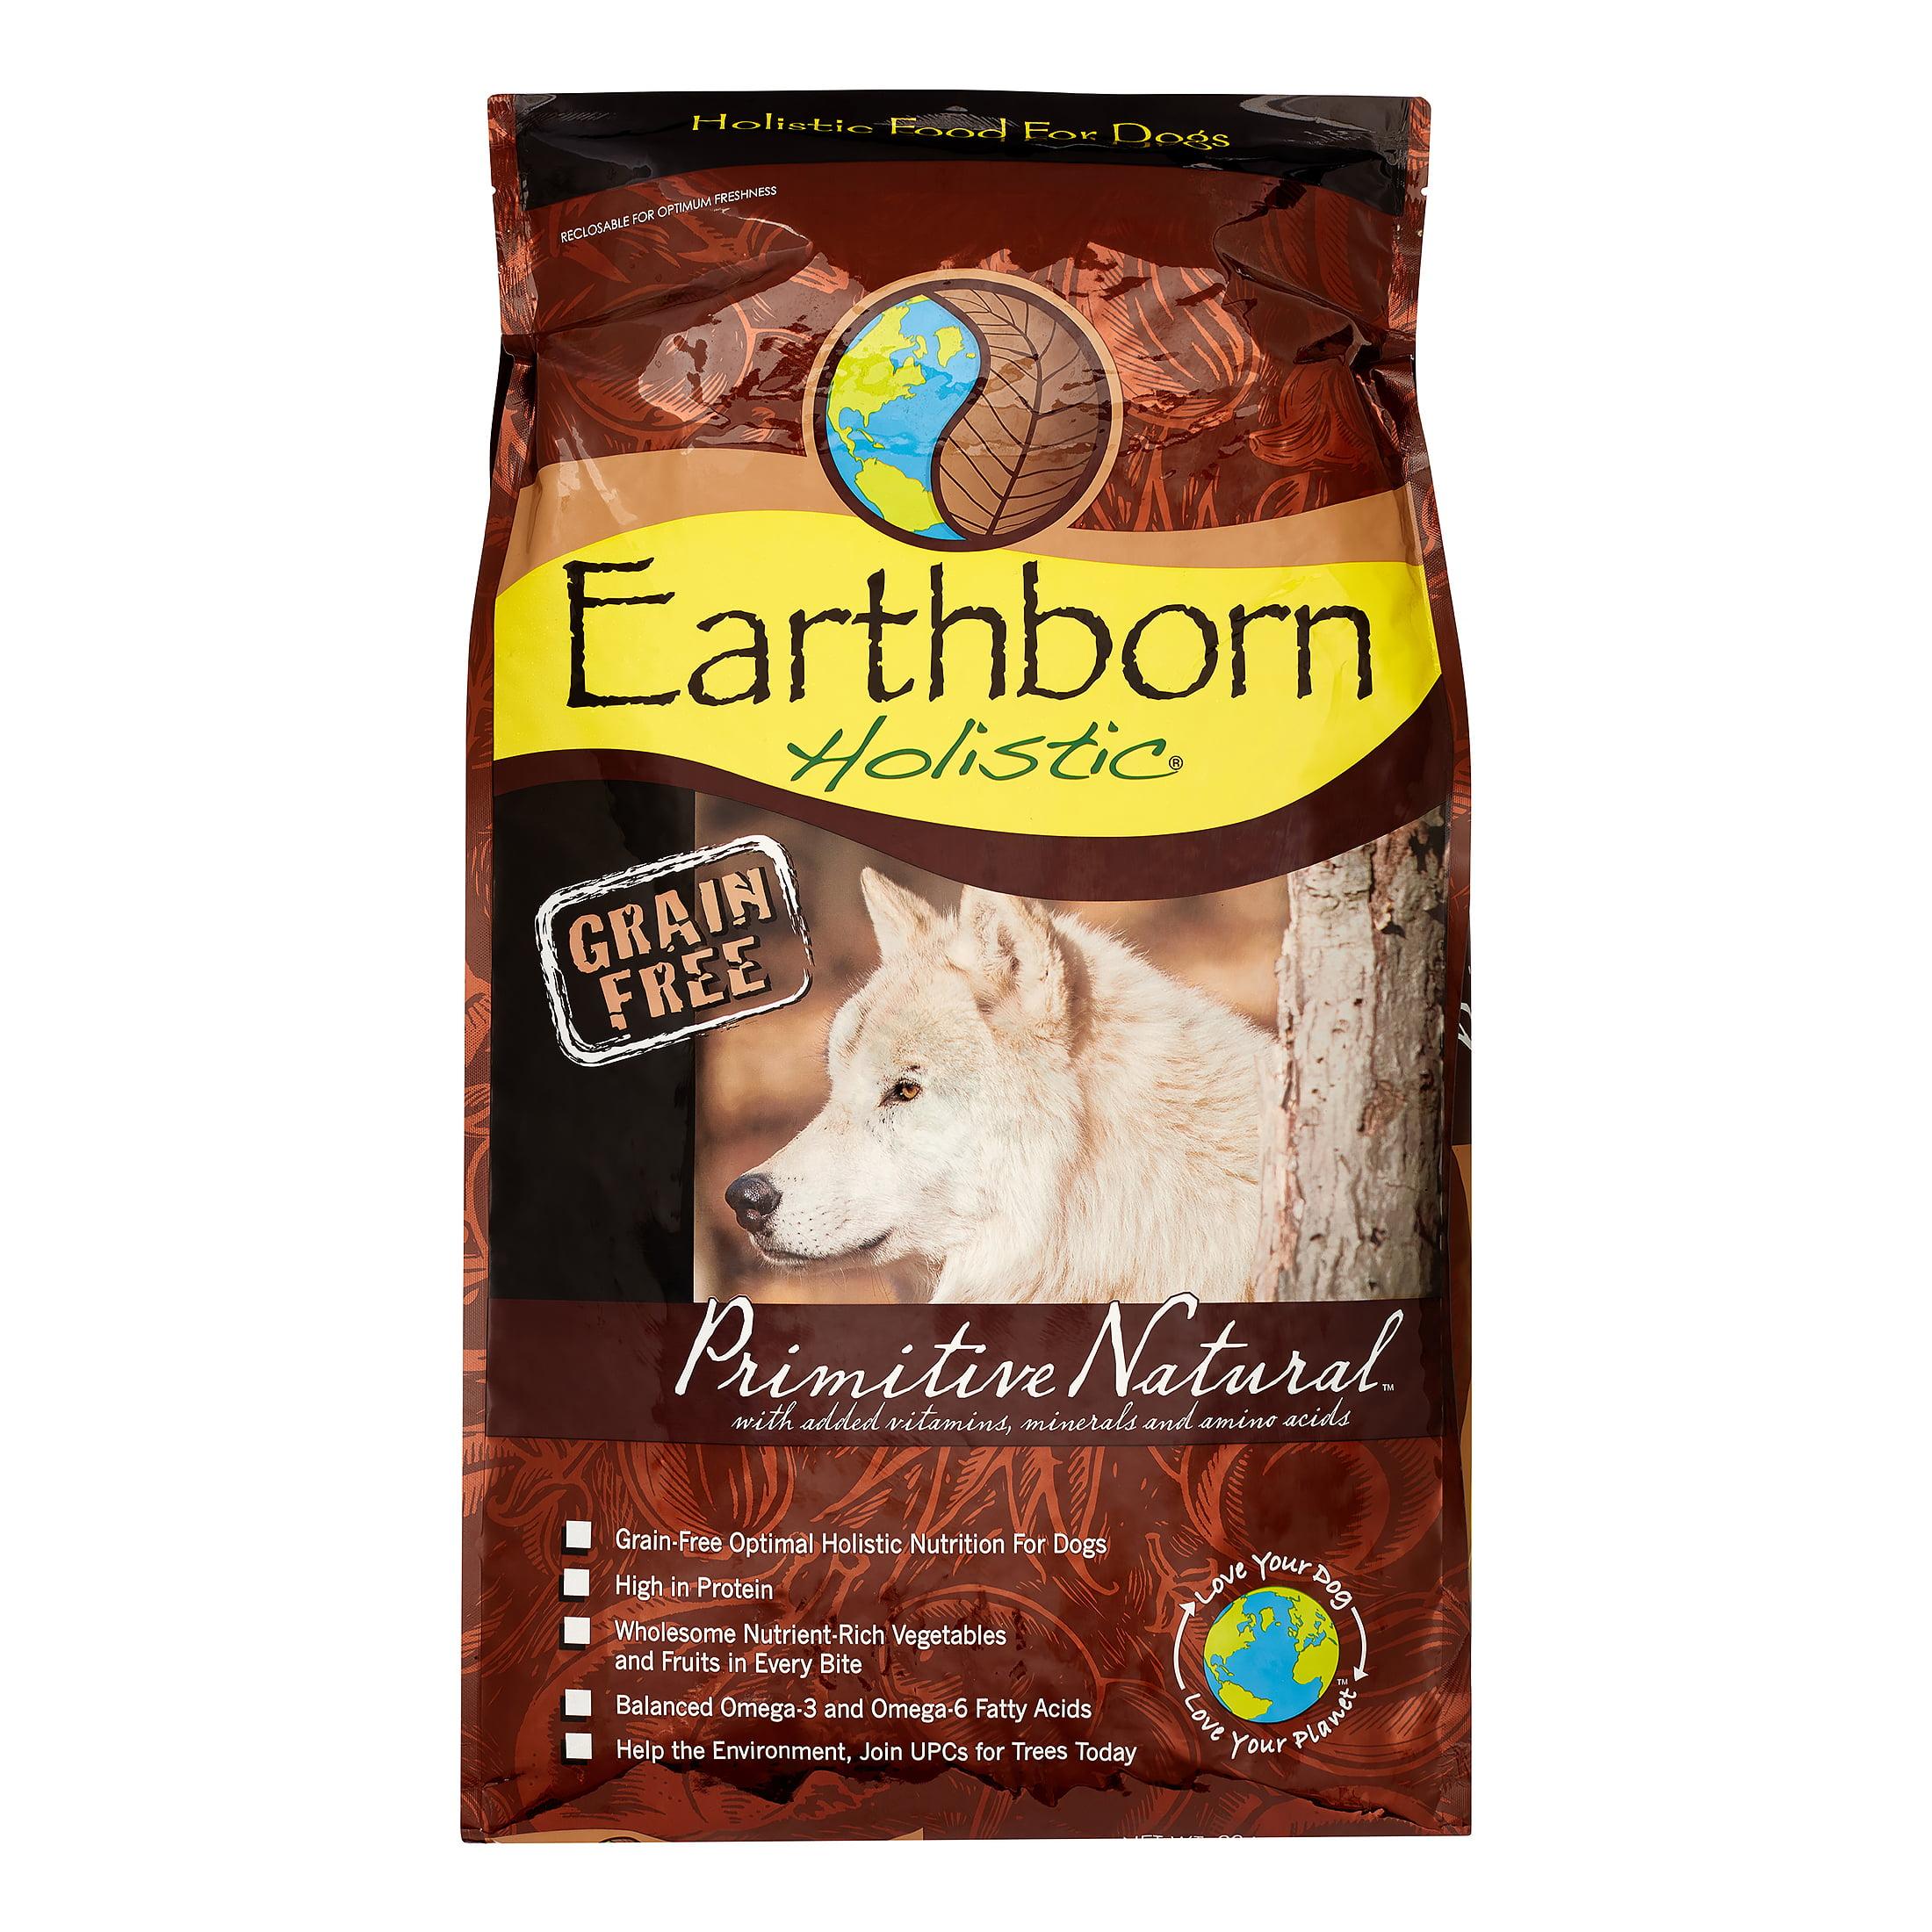 Earthborn Holistic Multi Protein Primative Natural Adult Dry Dog Food 28 Lb Walmart Com Walmart Com